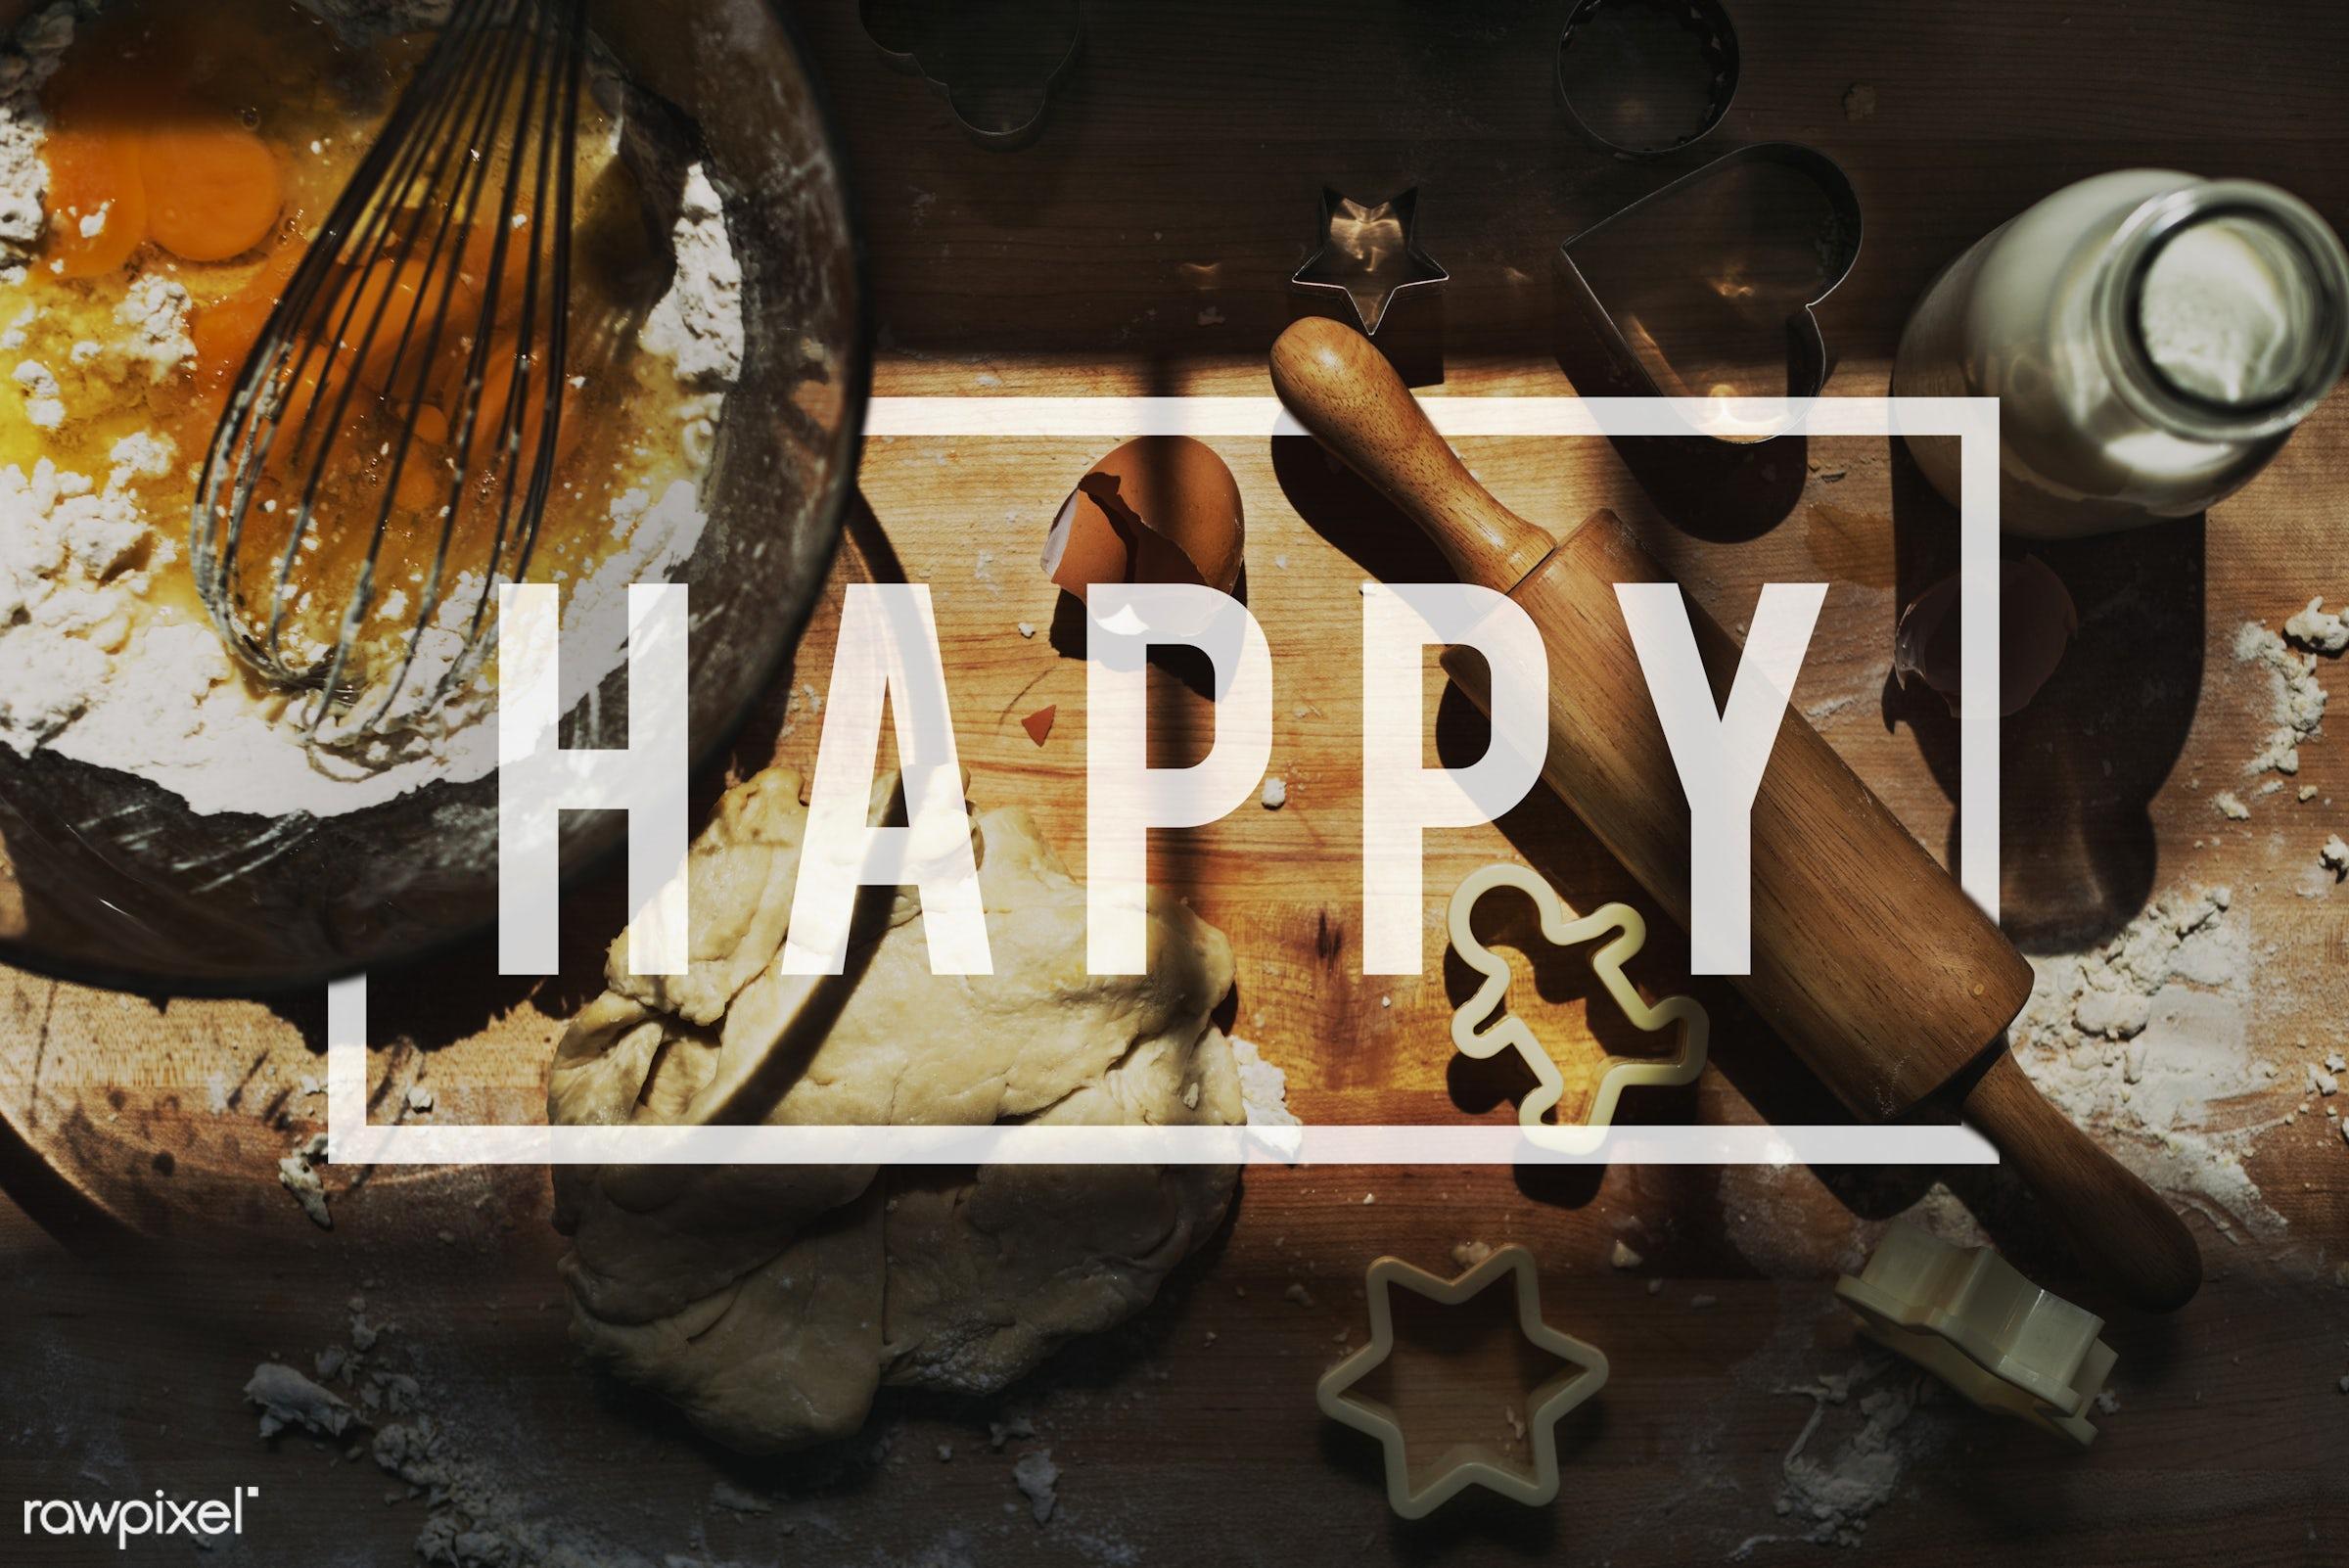 aerial view, attitude, badge, bake, bakery, baking, baking tool, banner, cheerful, cooking, enjoyment, equipment, flour,...